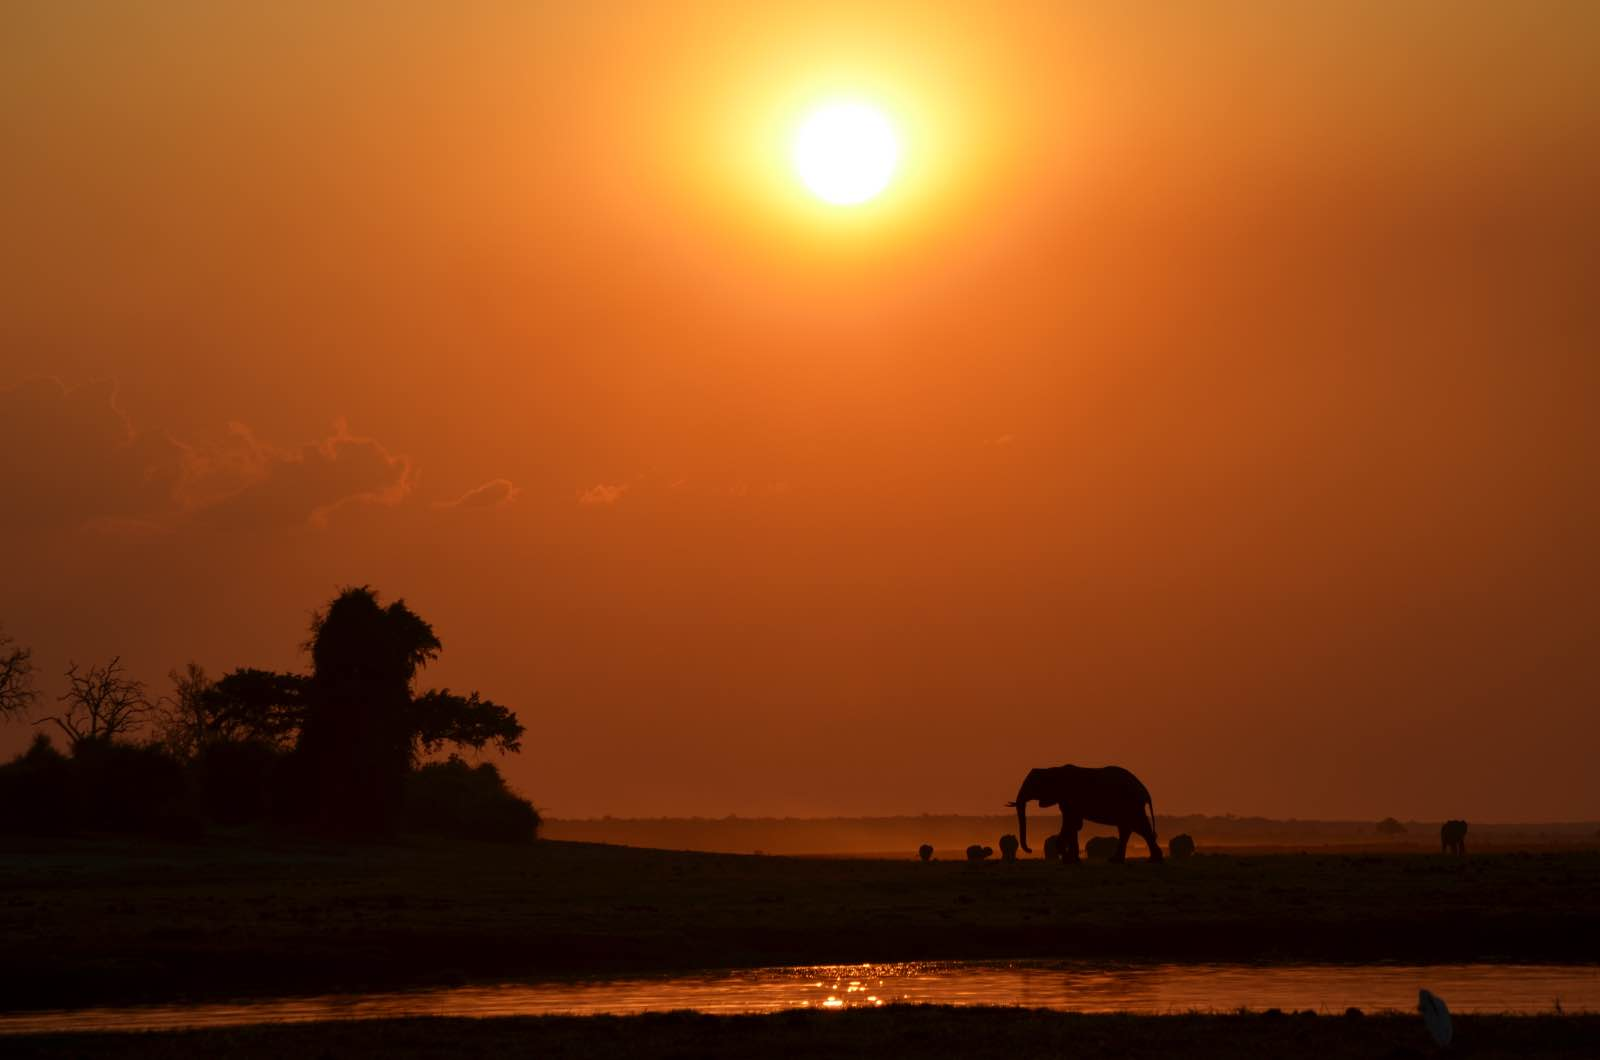 Scenes of a sunset at Chobe River at Chilwero